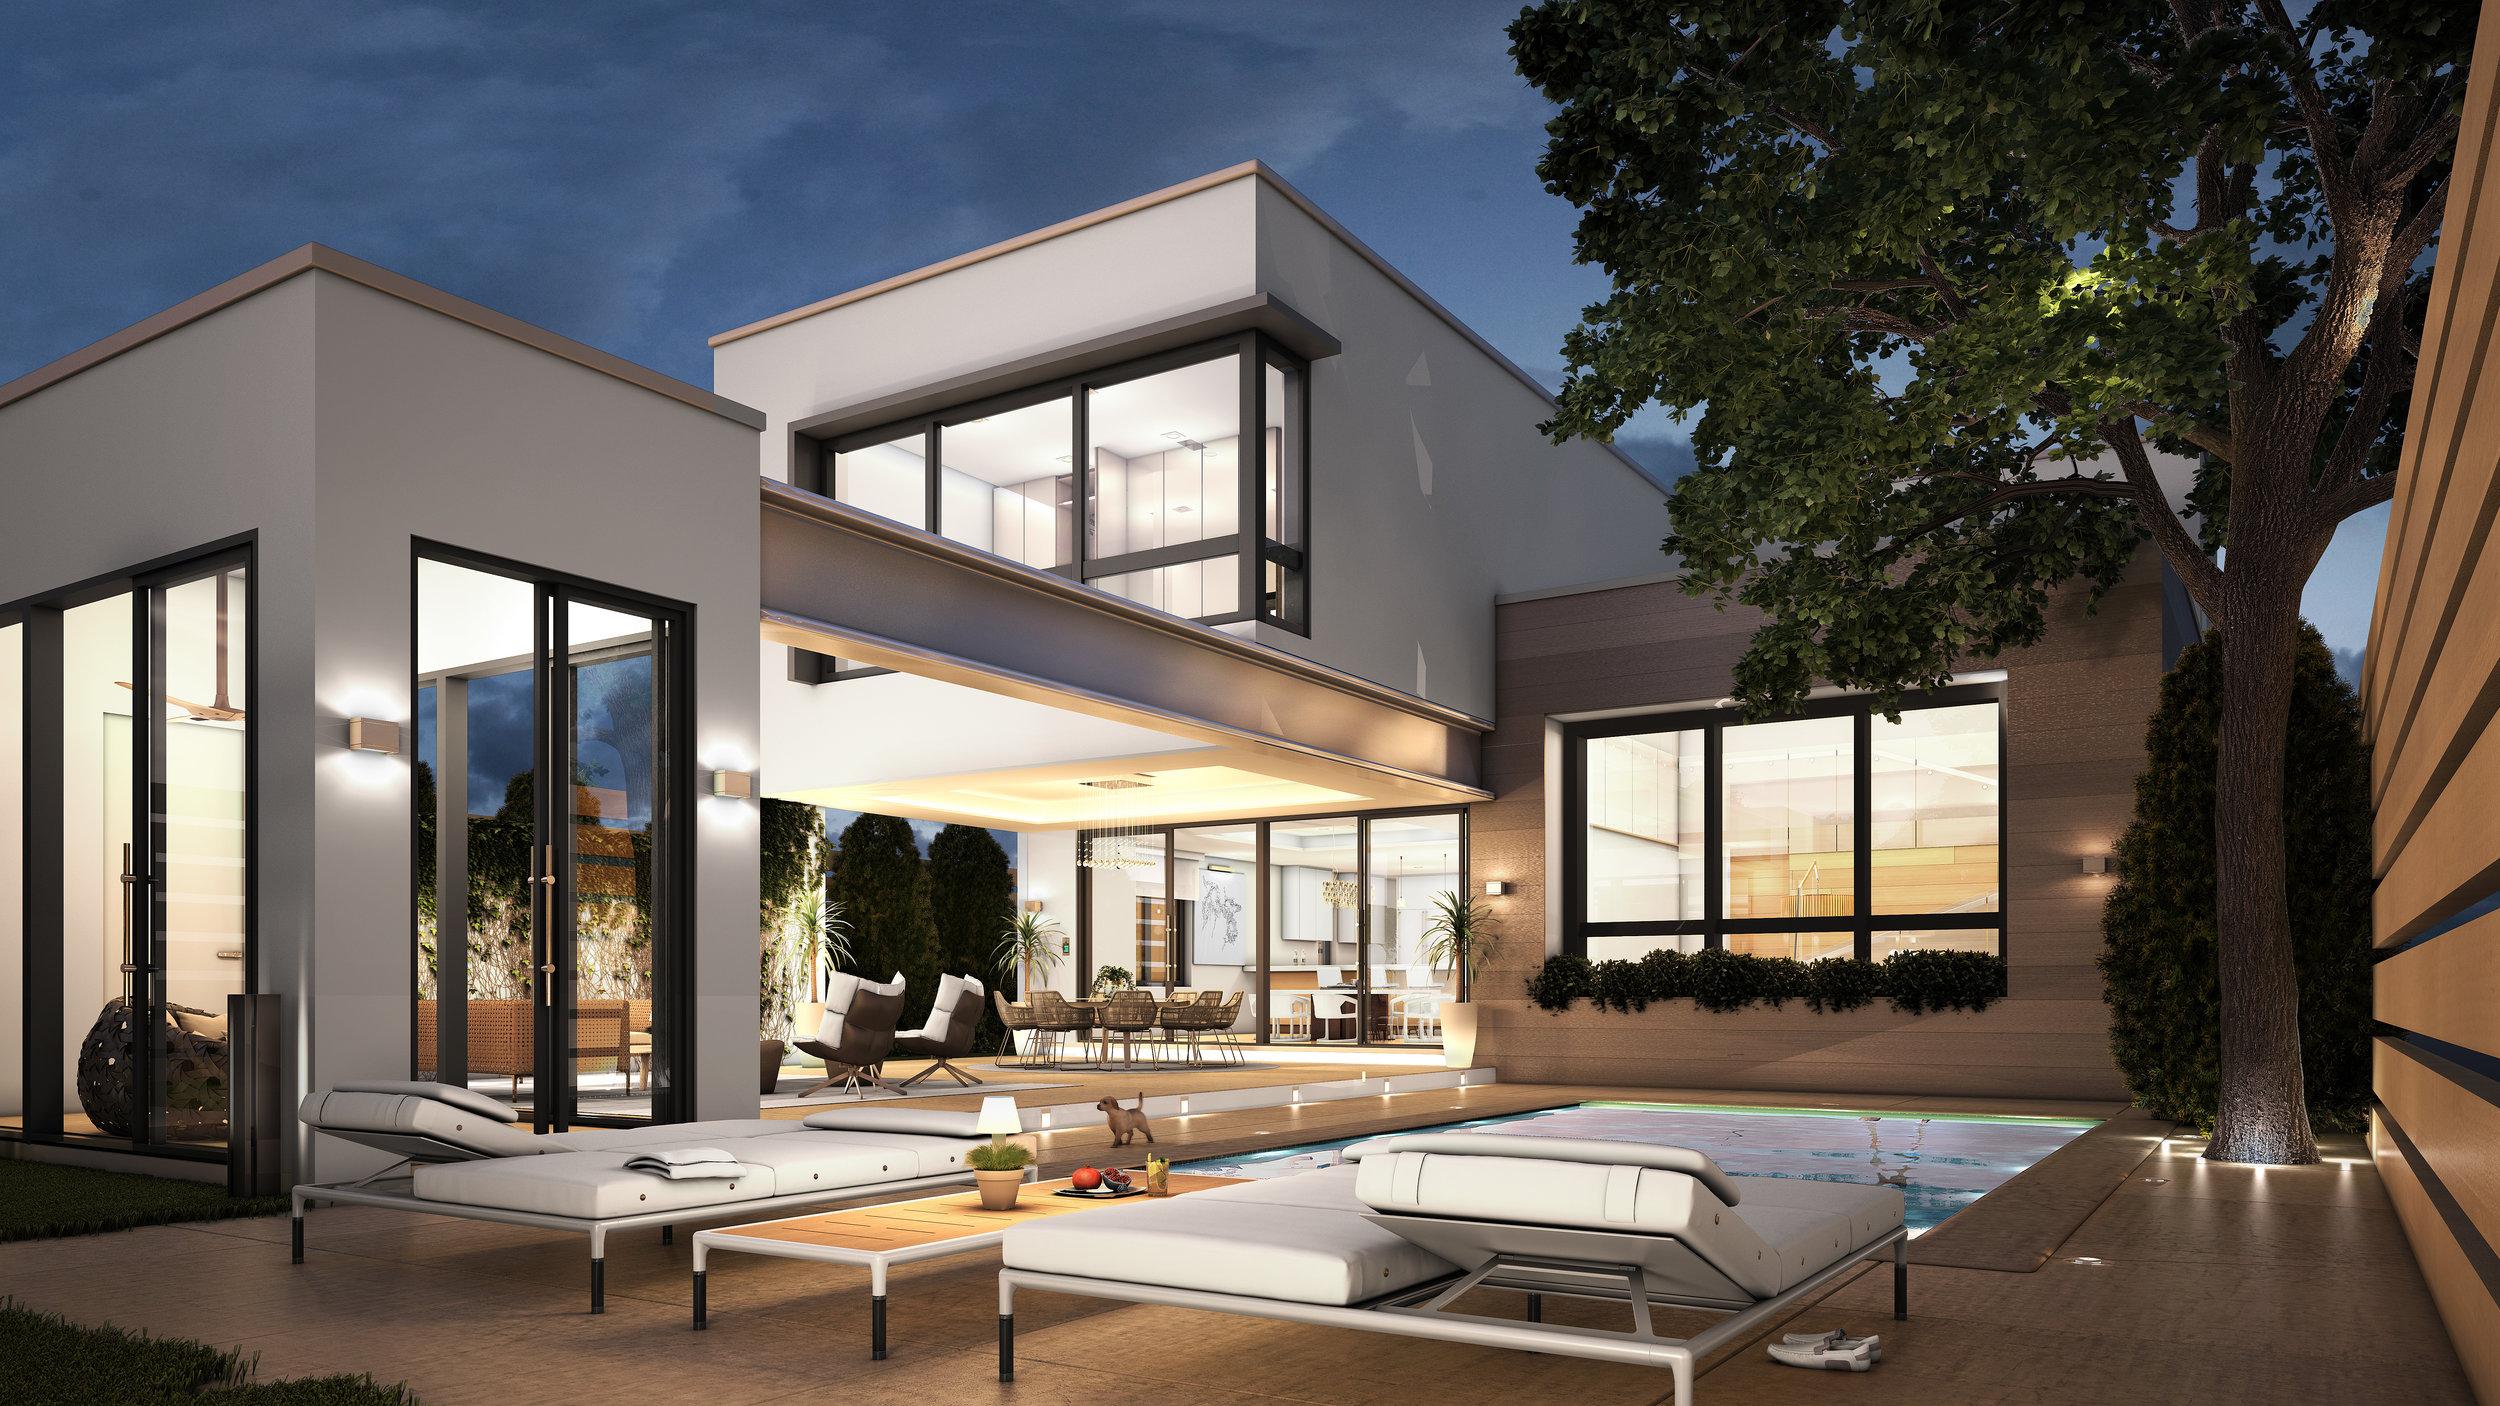 <b>Architecture</b>#View